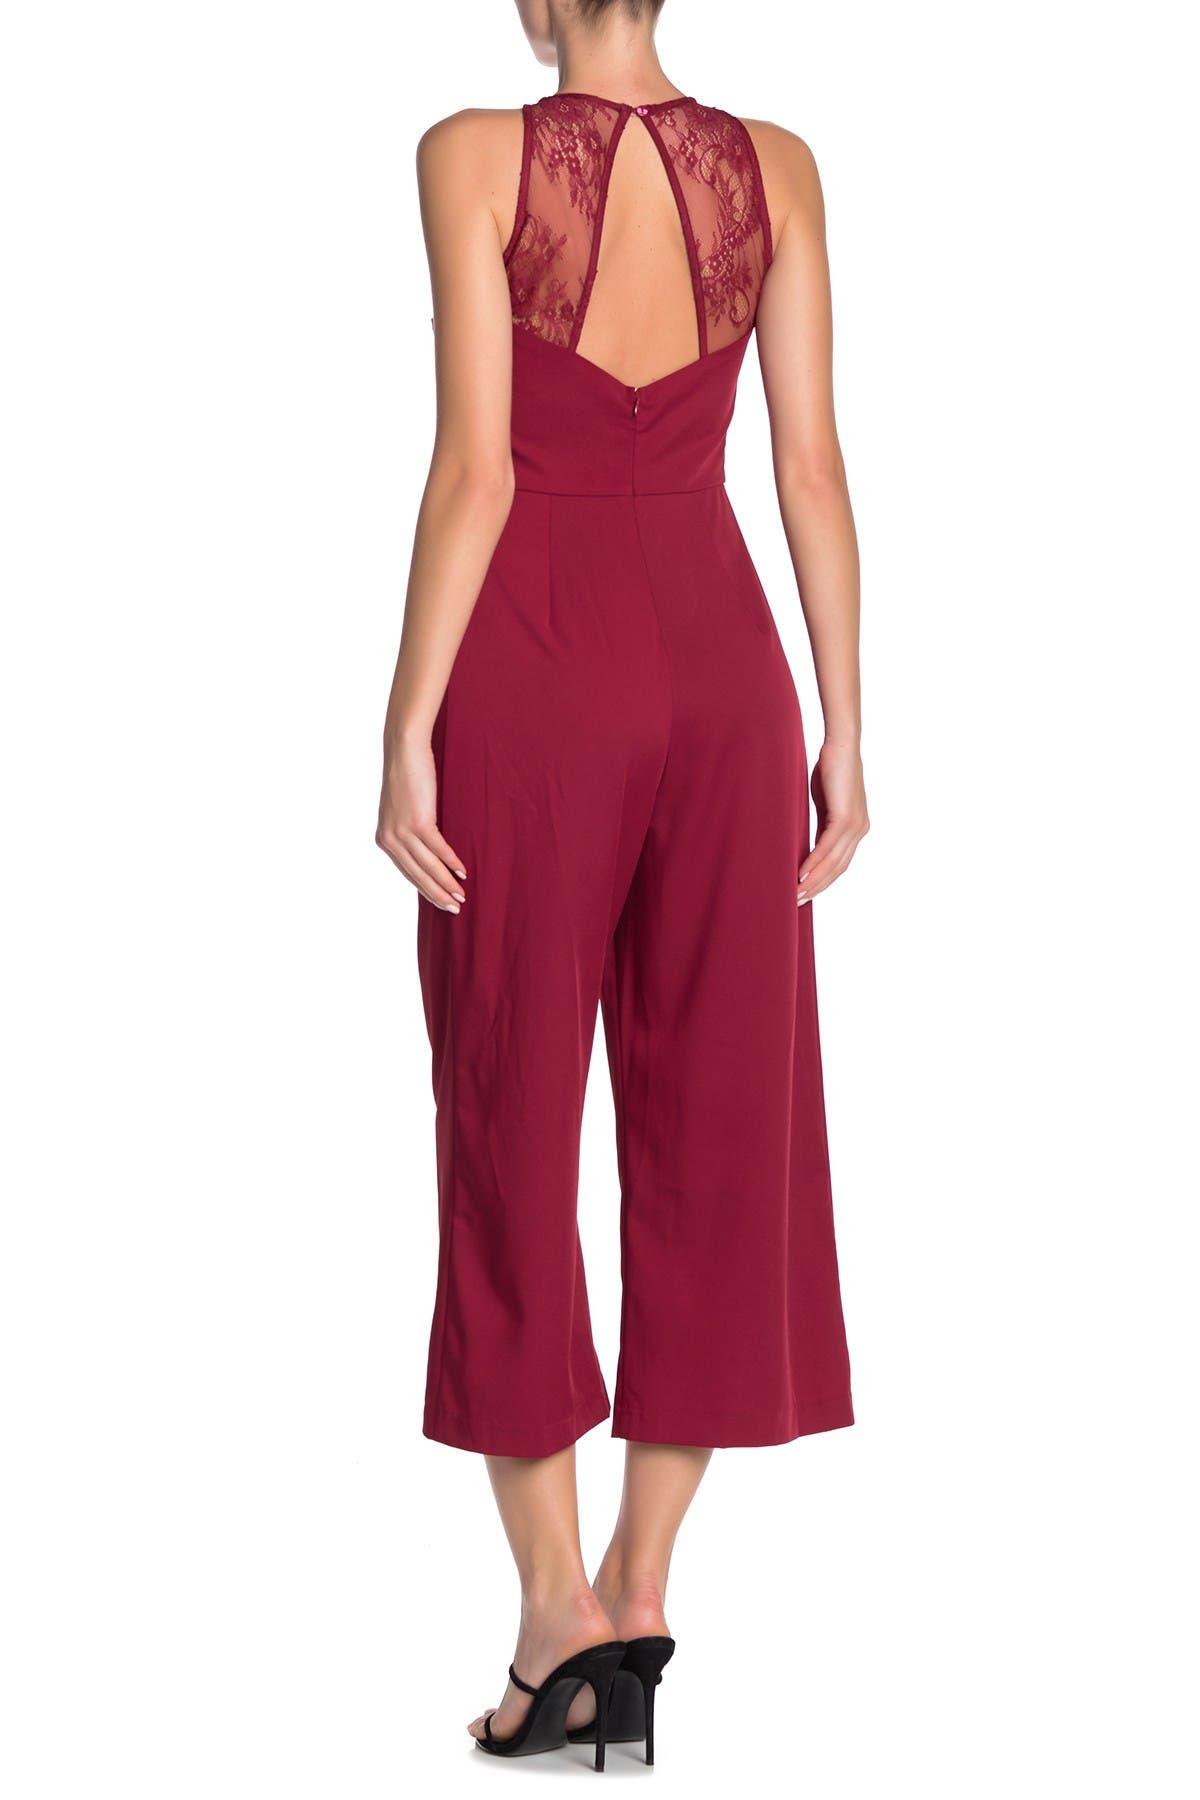 ONE ONE SIX Lace Sleeveless Jumpsuit